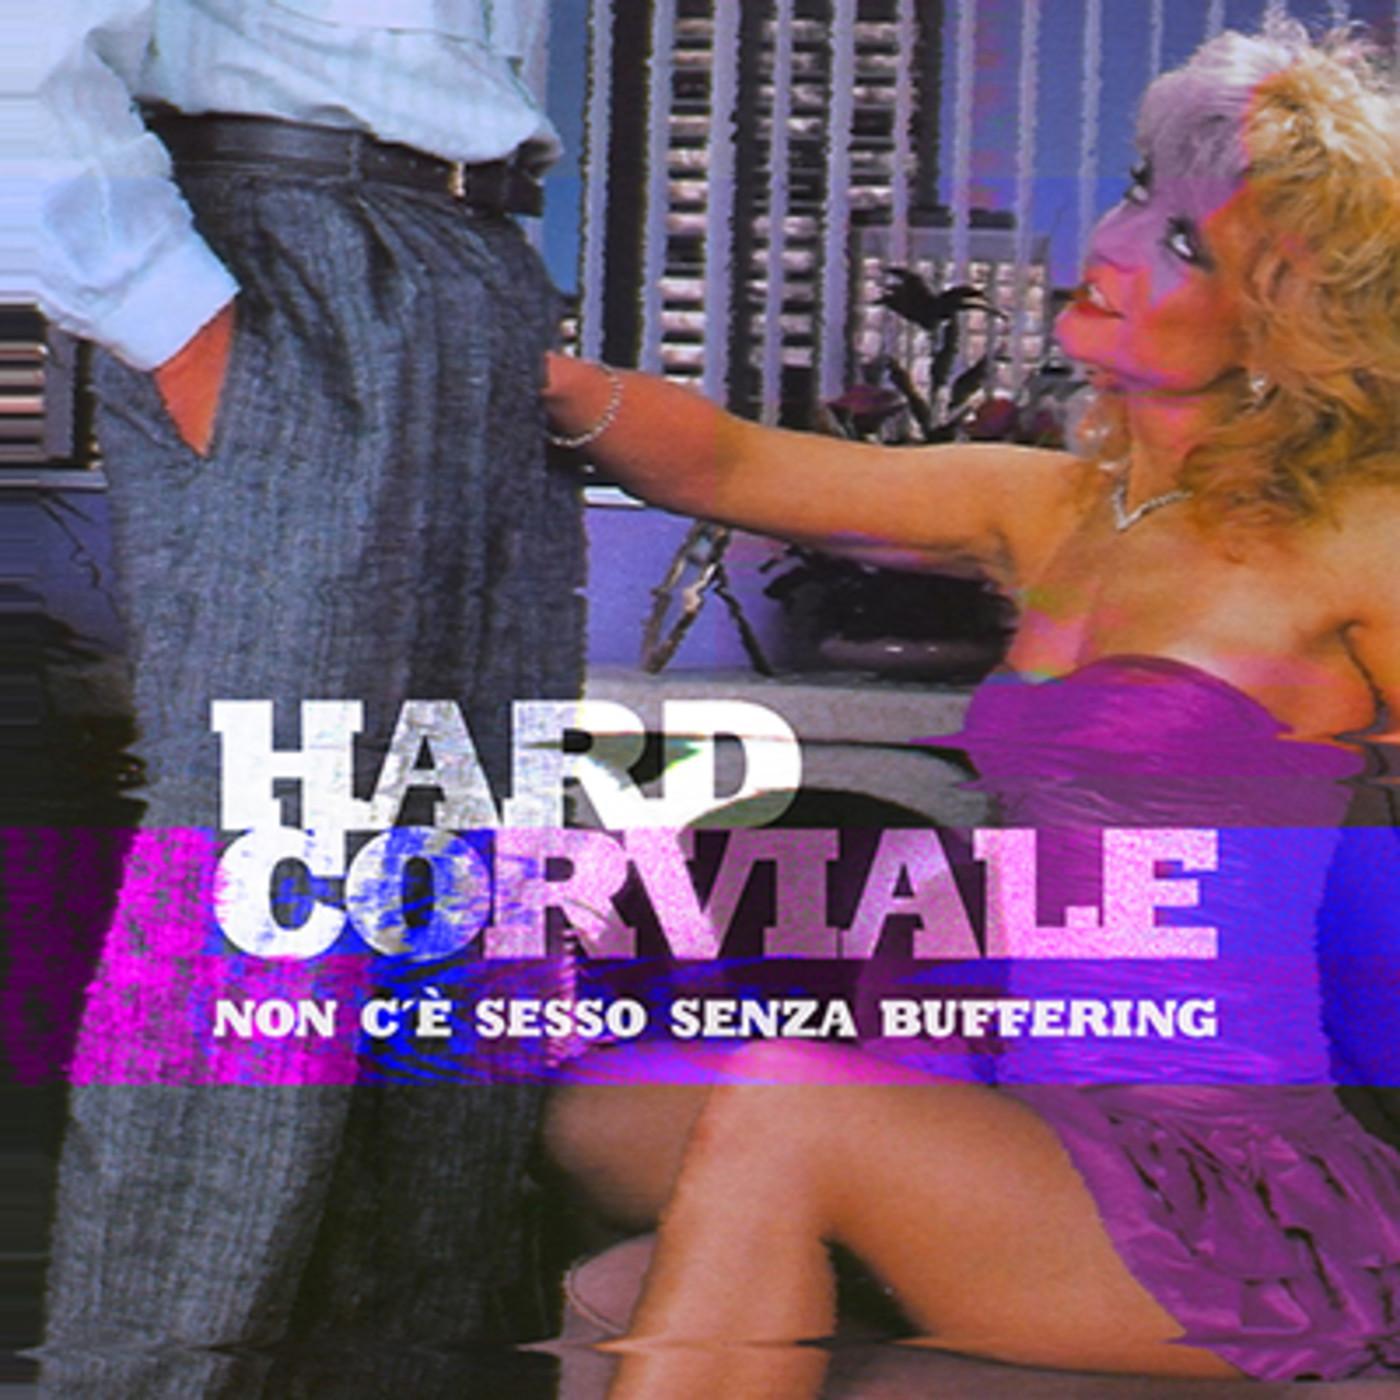 hardcorviale QPH7Xuiy4jG In vacanza con 5 podcast italiani